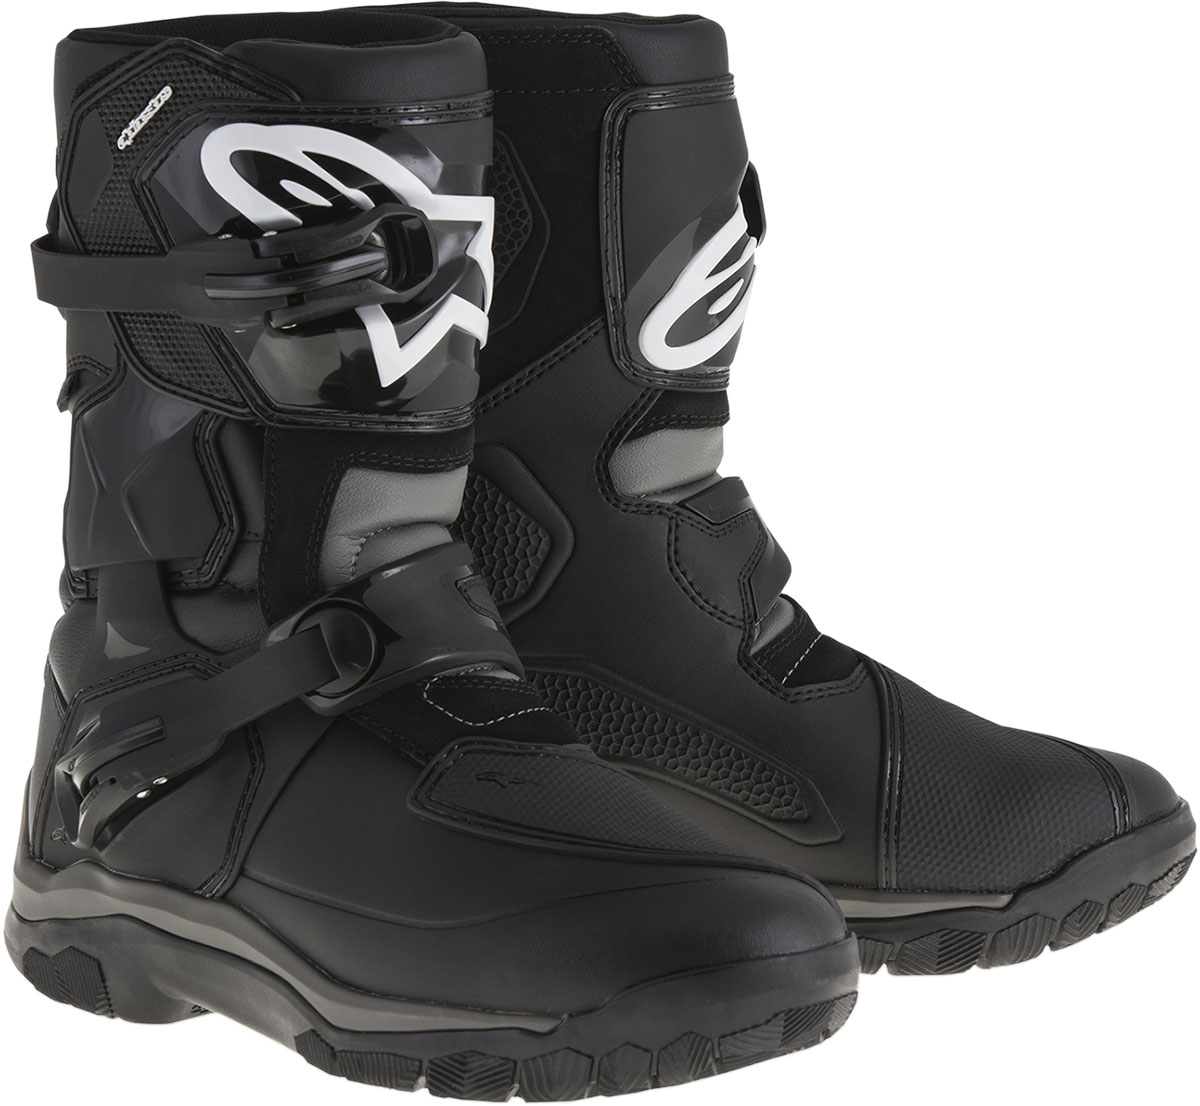 Alpinestars BELIZE Drystar Leather/Suede Touring Boots (Black)